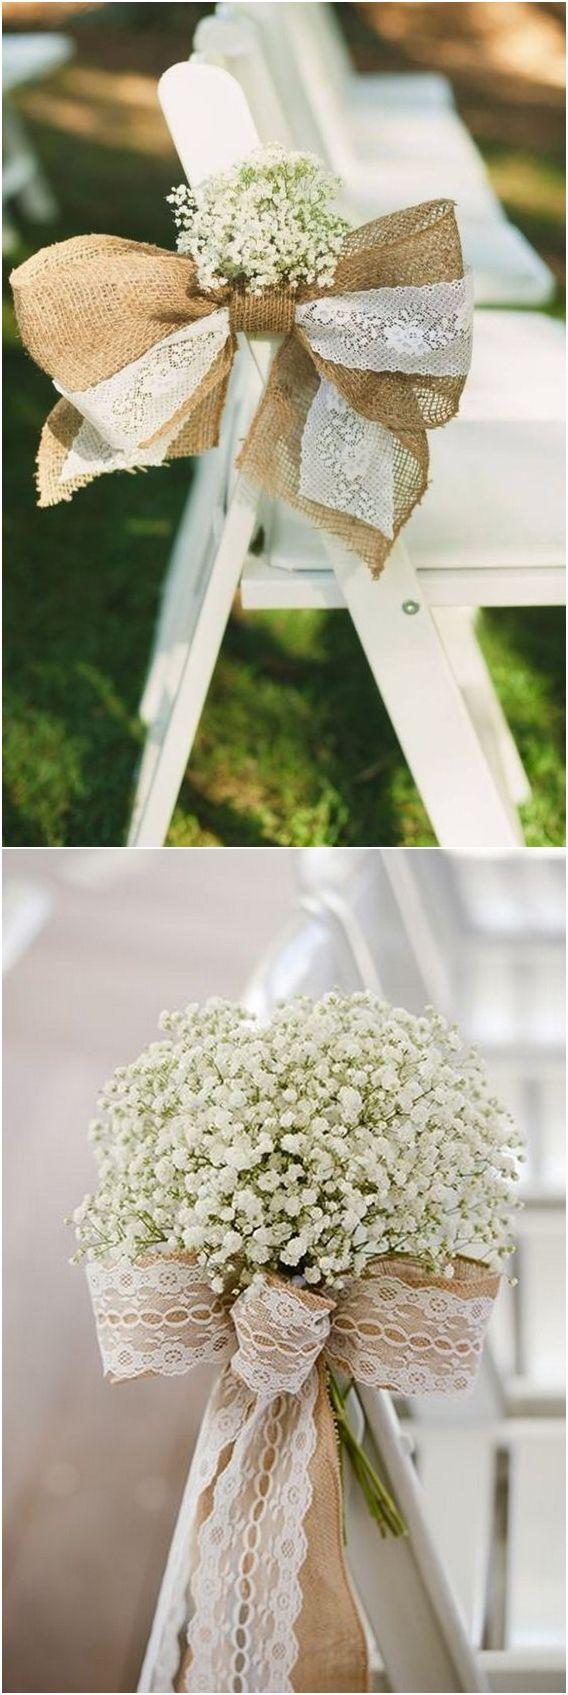 20 Rustic Country Burlap Wedding Chair Decor Ideas #weddings #weddingideas #rustic #backyard